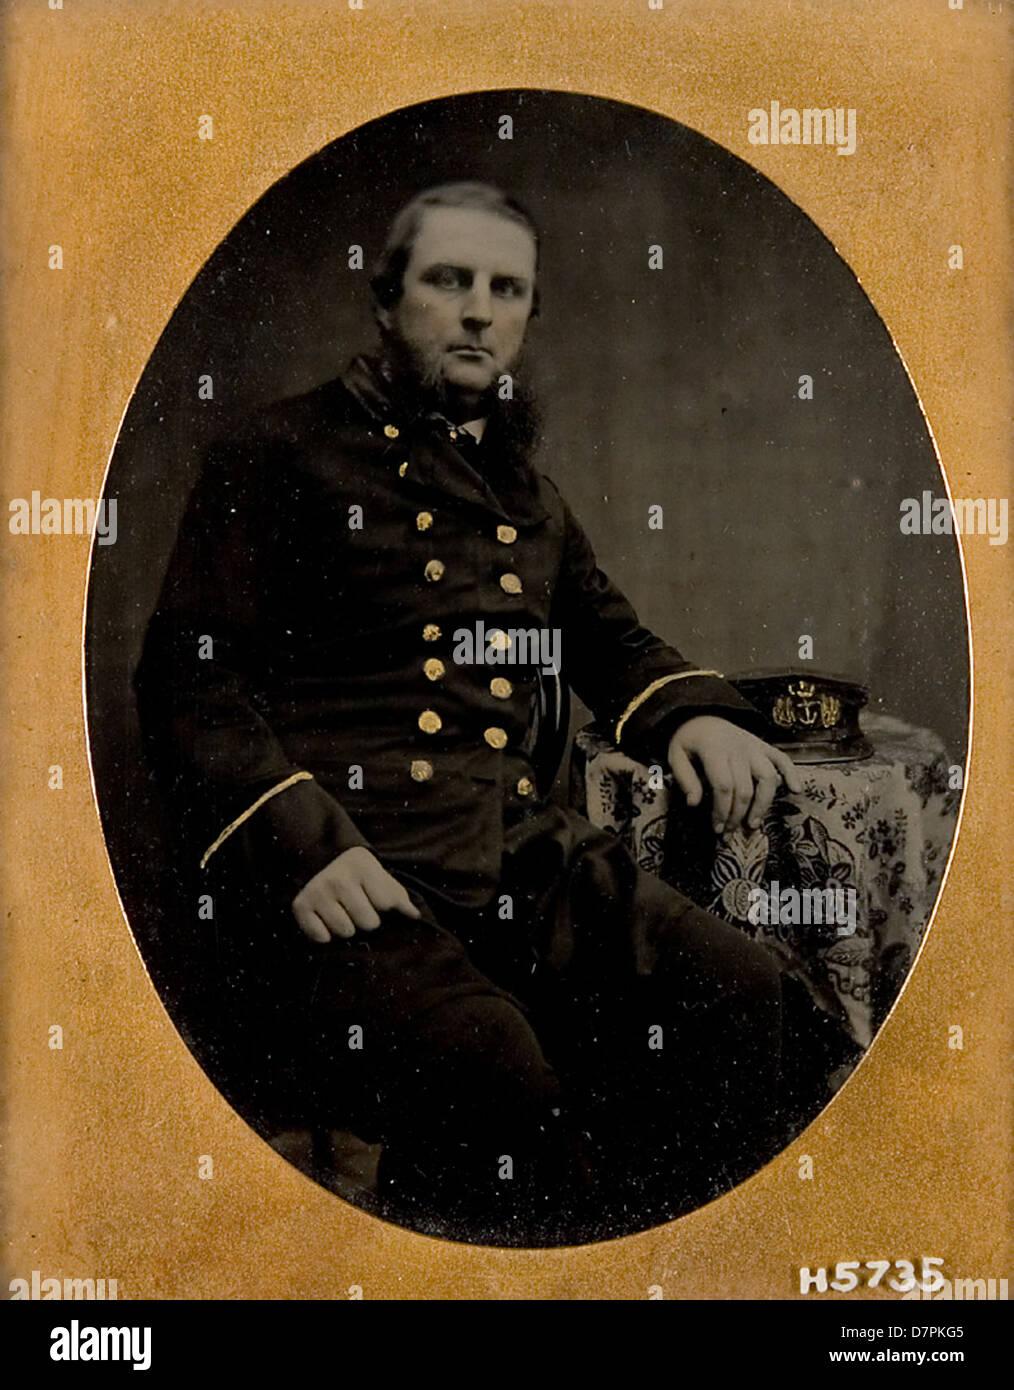 Unidentified Royal Navy Lieutenant or Sub-Lieutenant - Stock Image